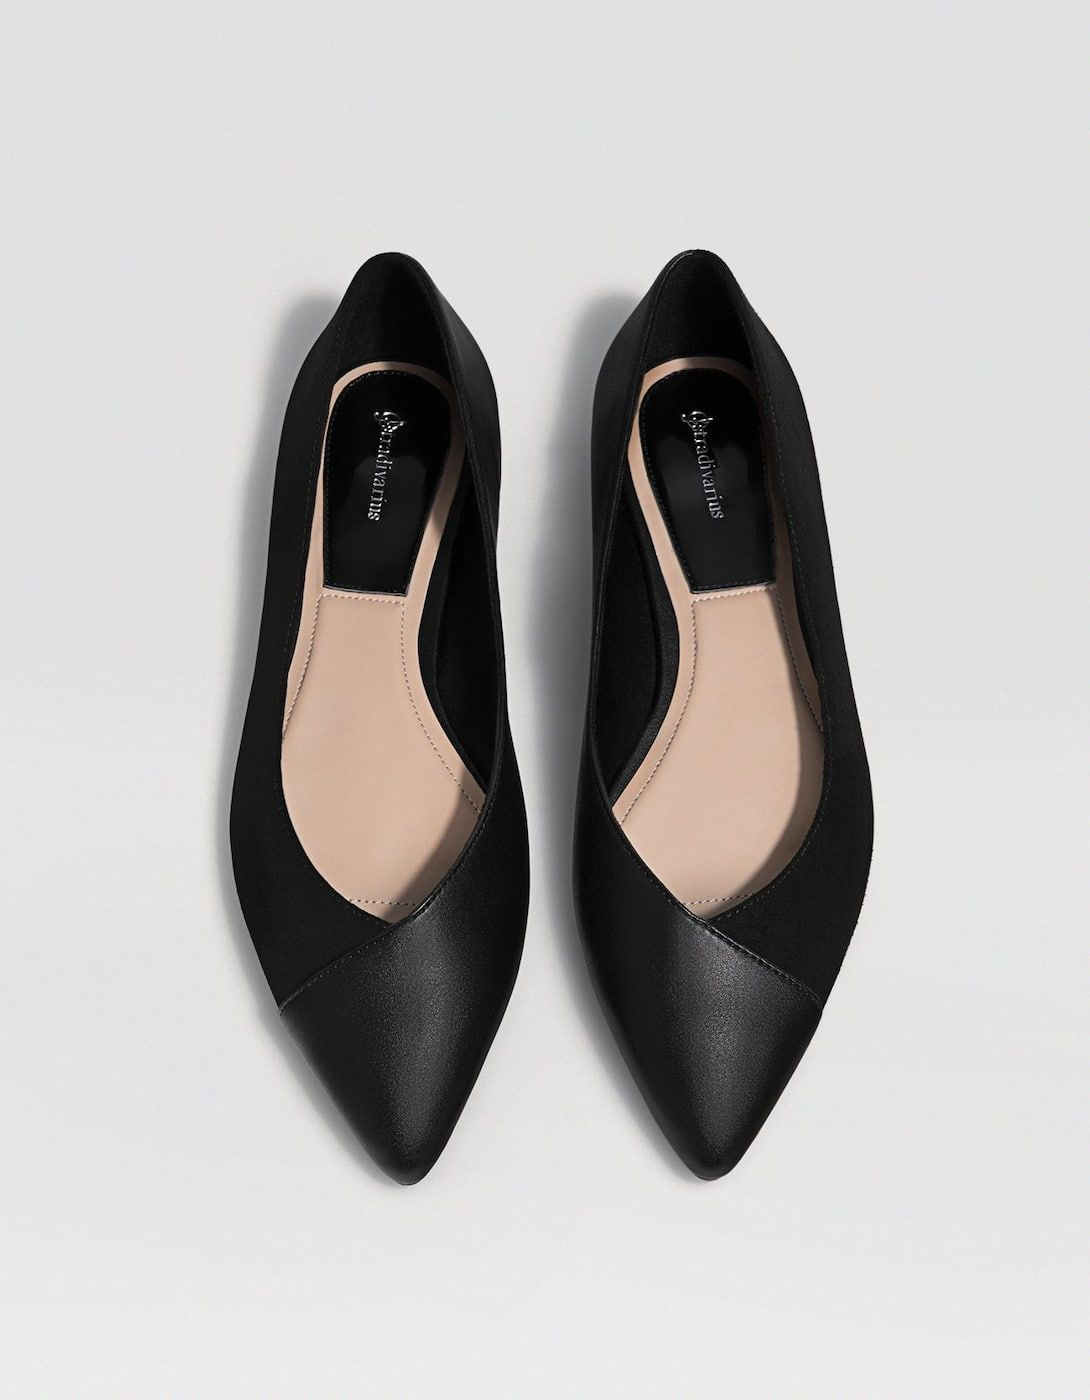 fe332d044e Czarne balerinki - Płaskie buty | Stradivarius Polska Zapatos Negros  Planos, Bailarinas Zapatos, Calzas